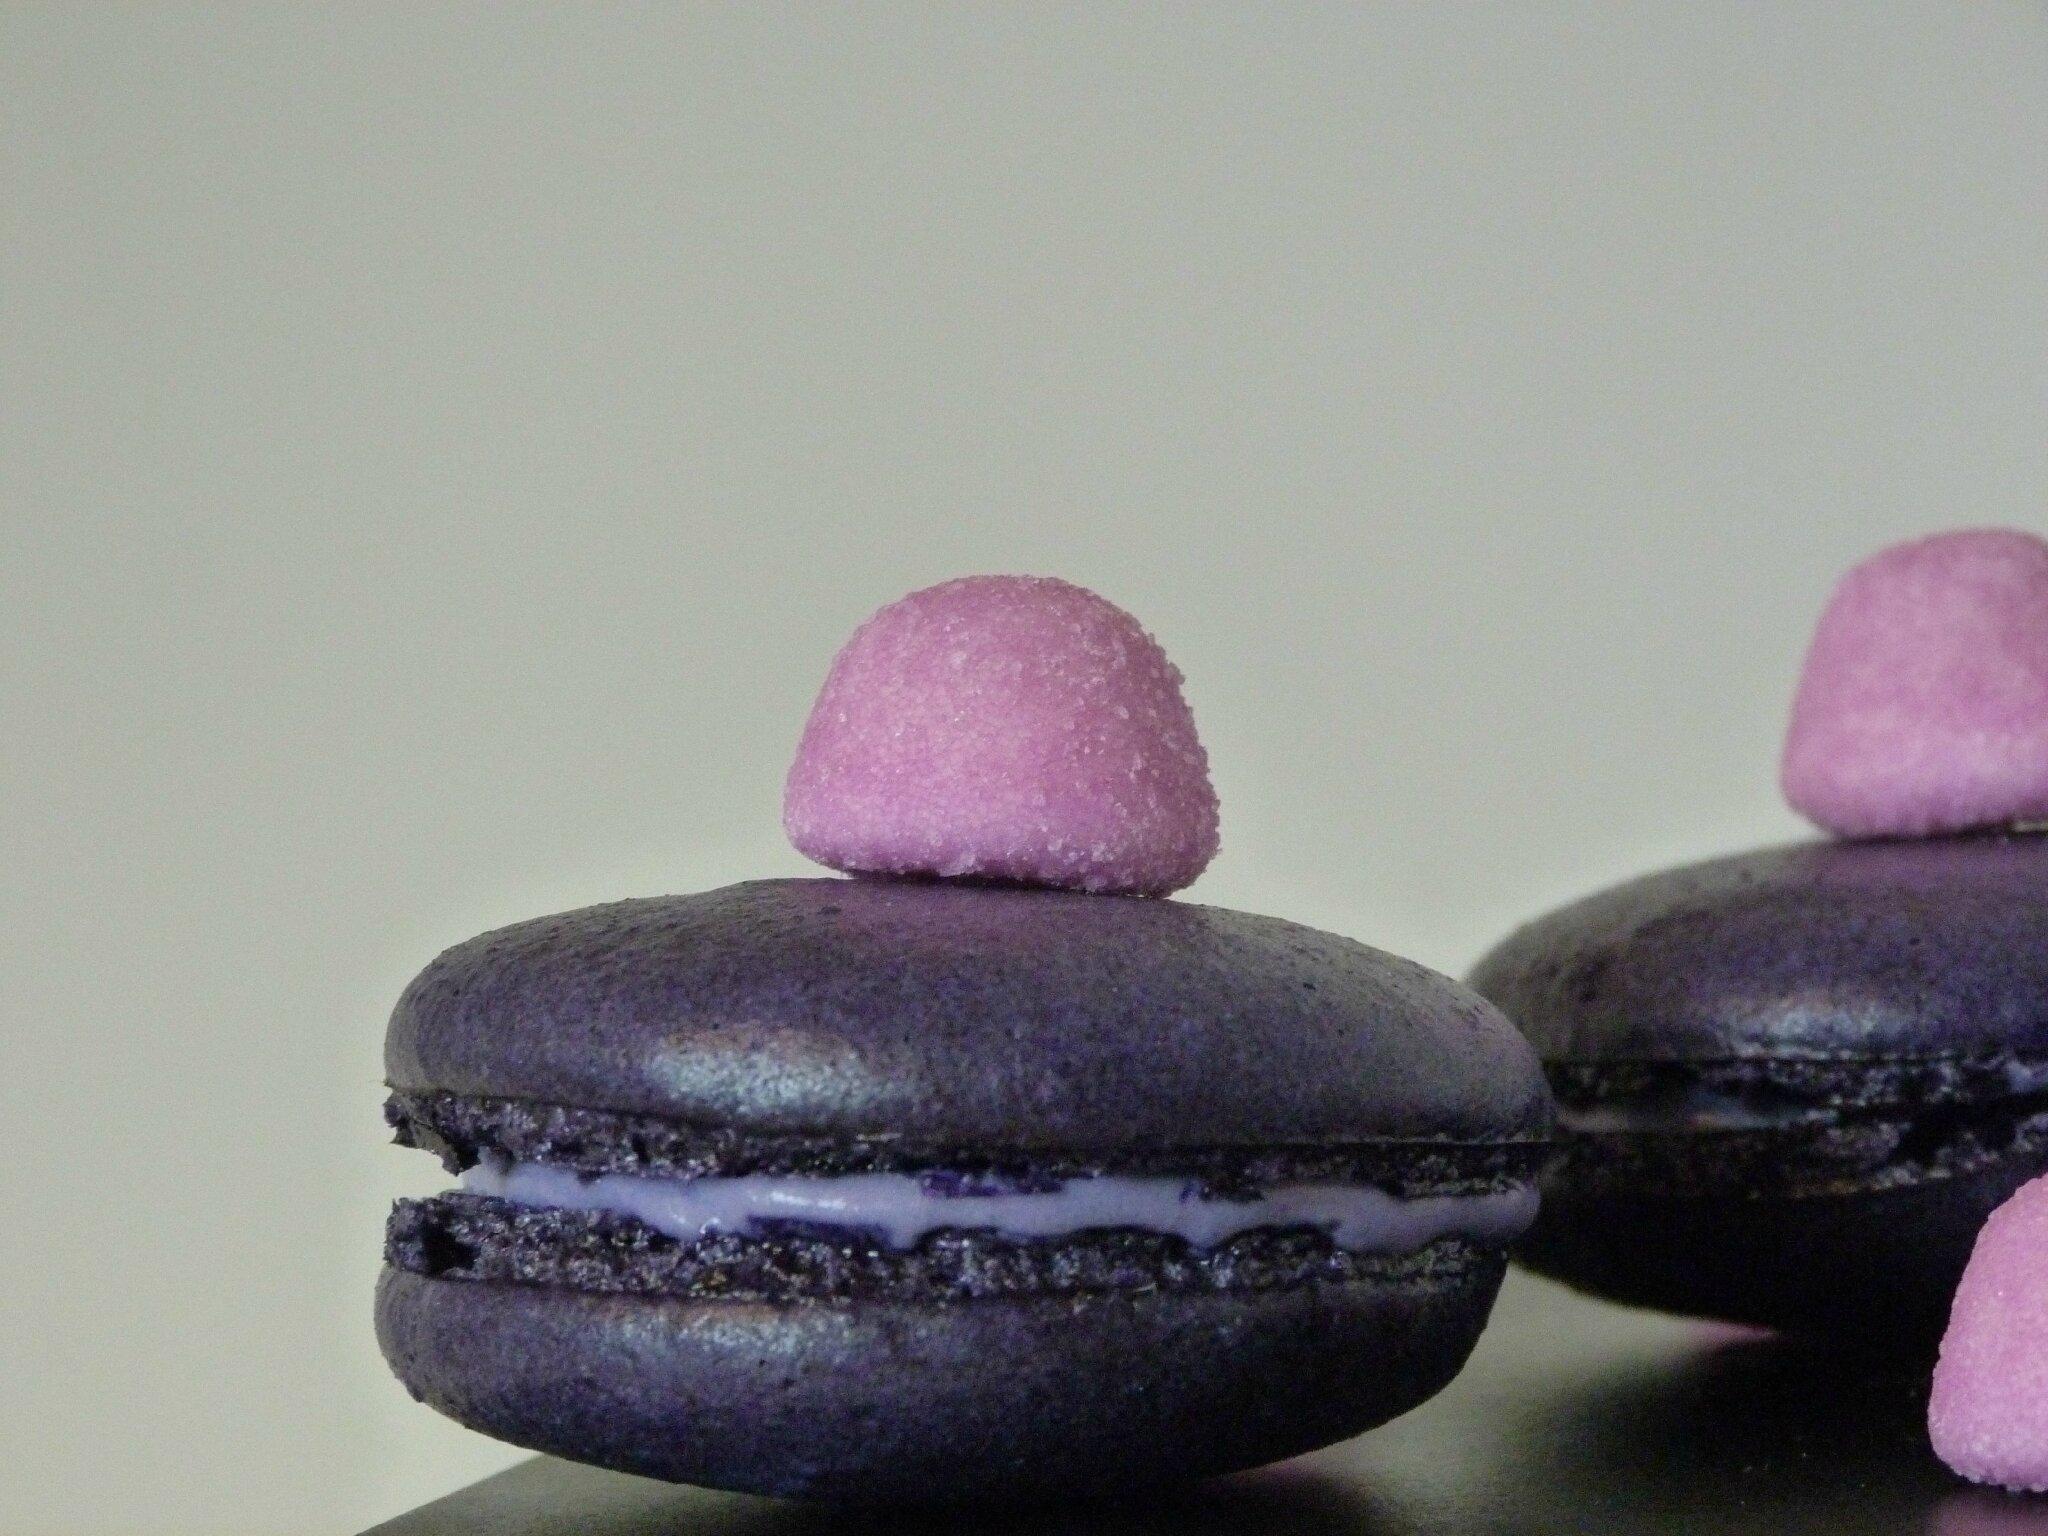 macaron fraise tagada purple 2